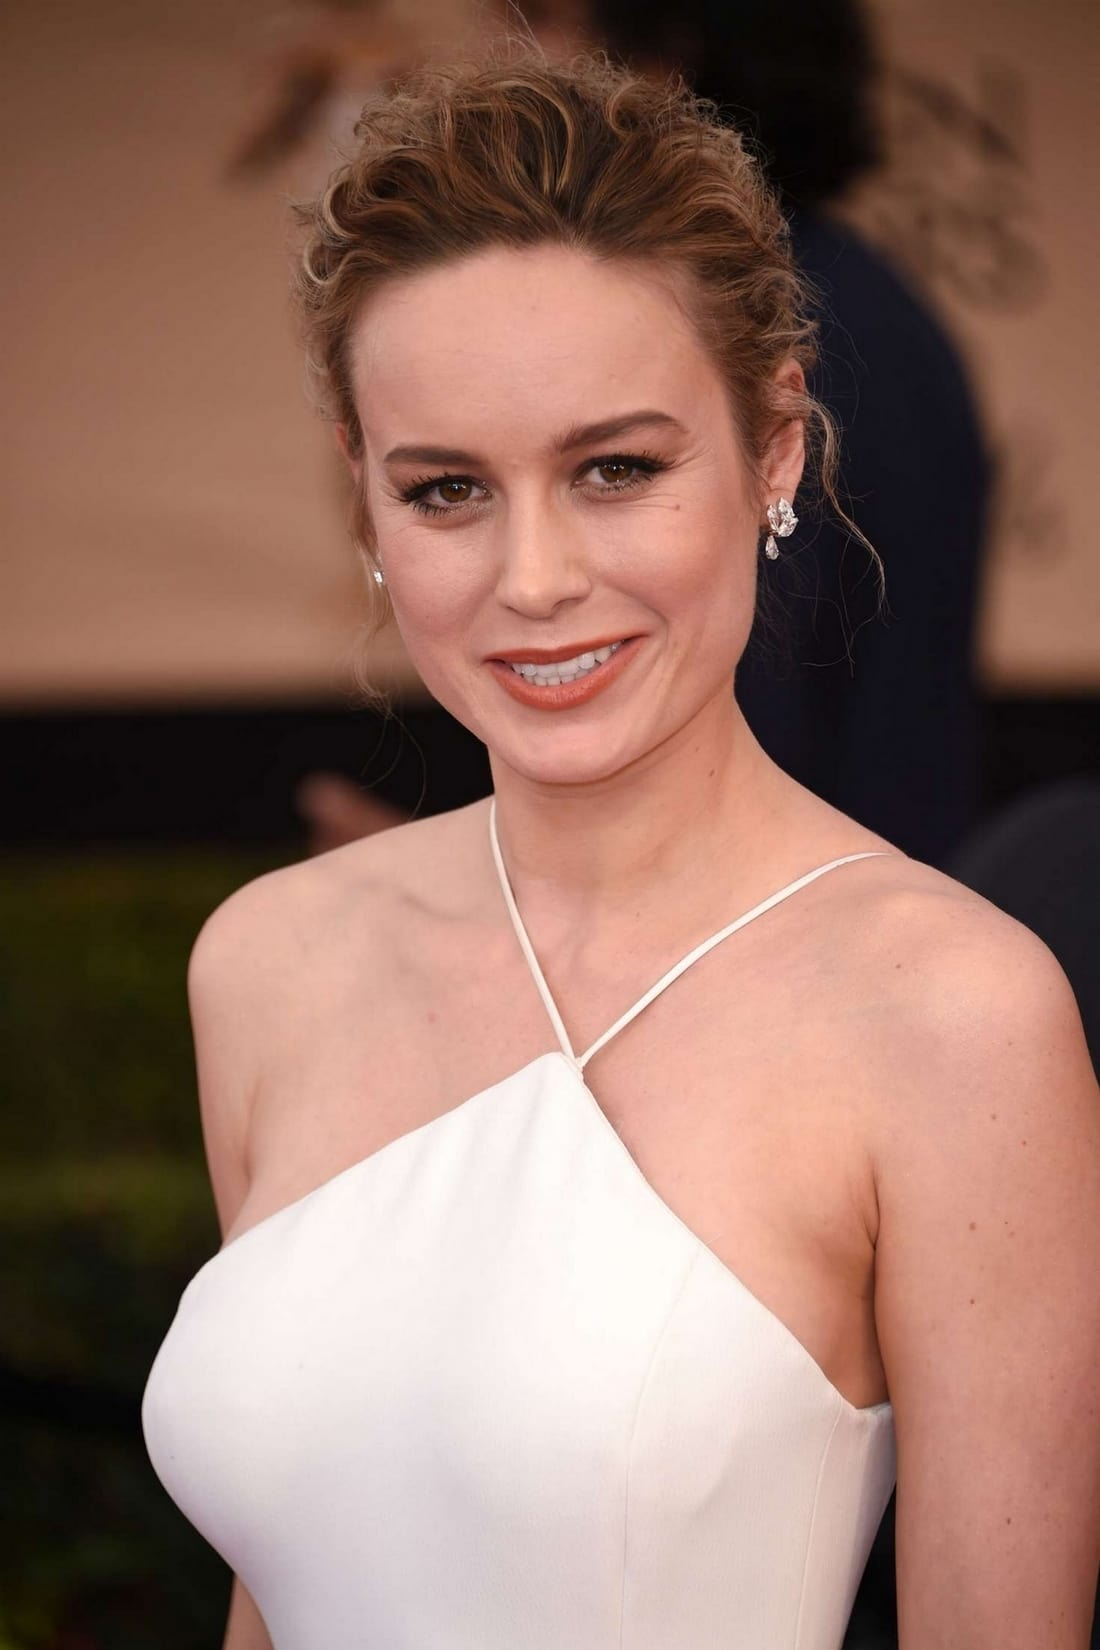 Brie Larson filmography and biography on moviesfilmcinecom